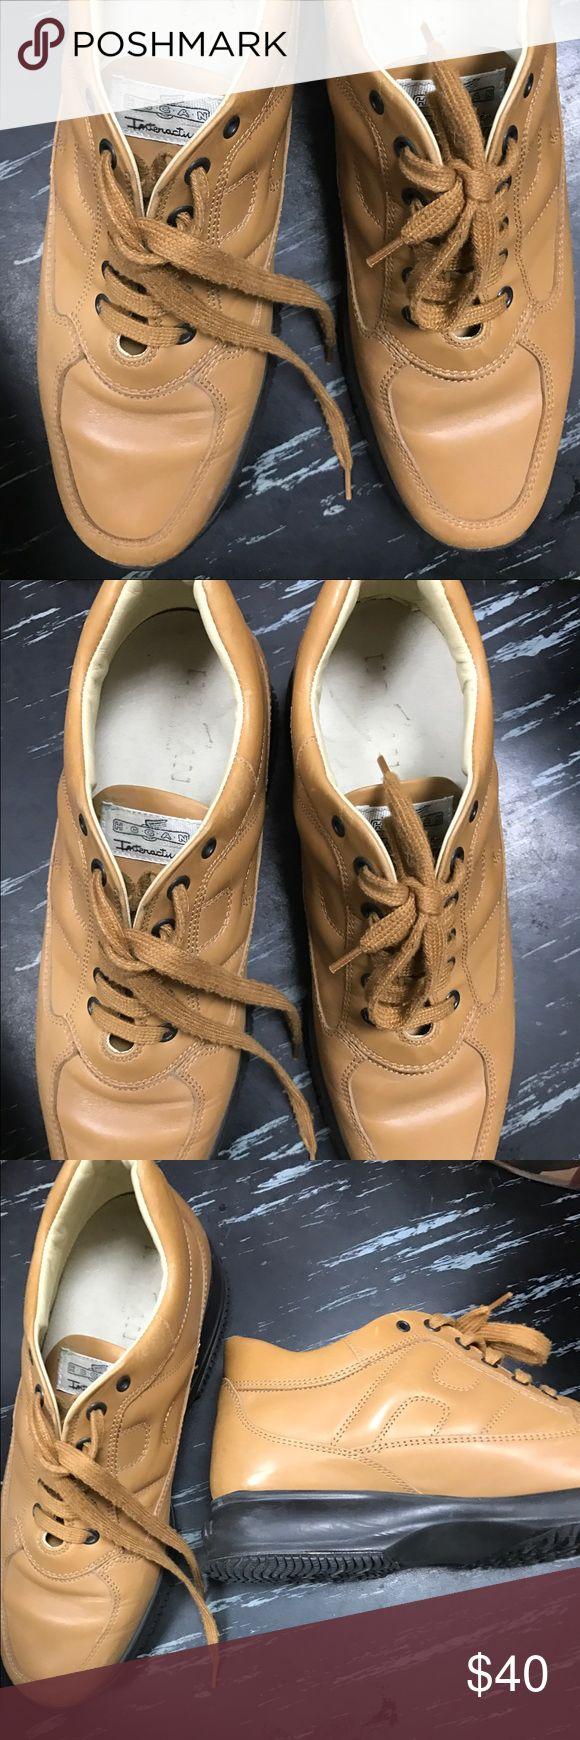 Hogan tan leather lace up sneakers Hogan camel leather lace sneakers Hogan Shoes Sneakers